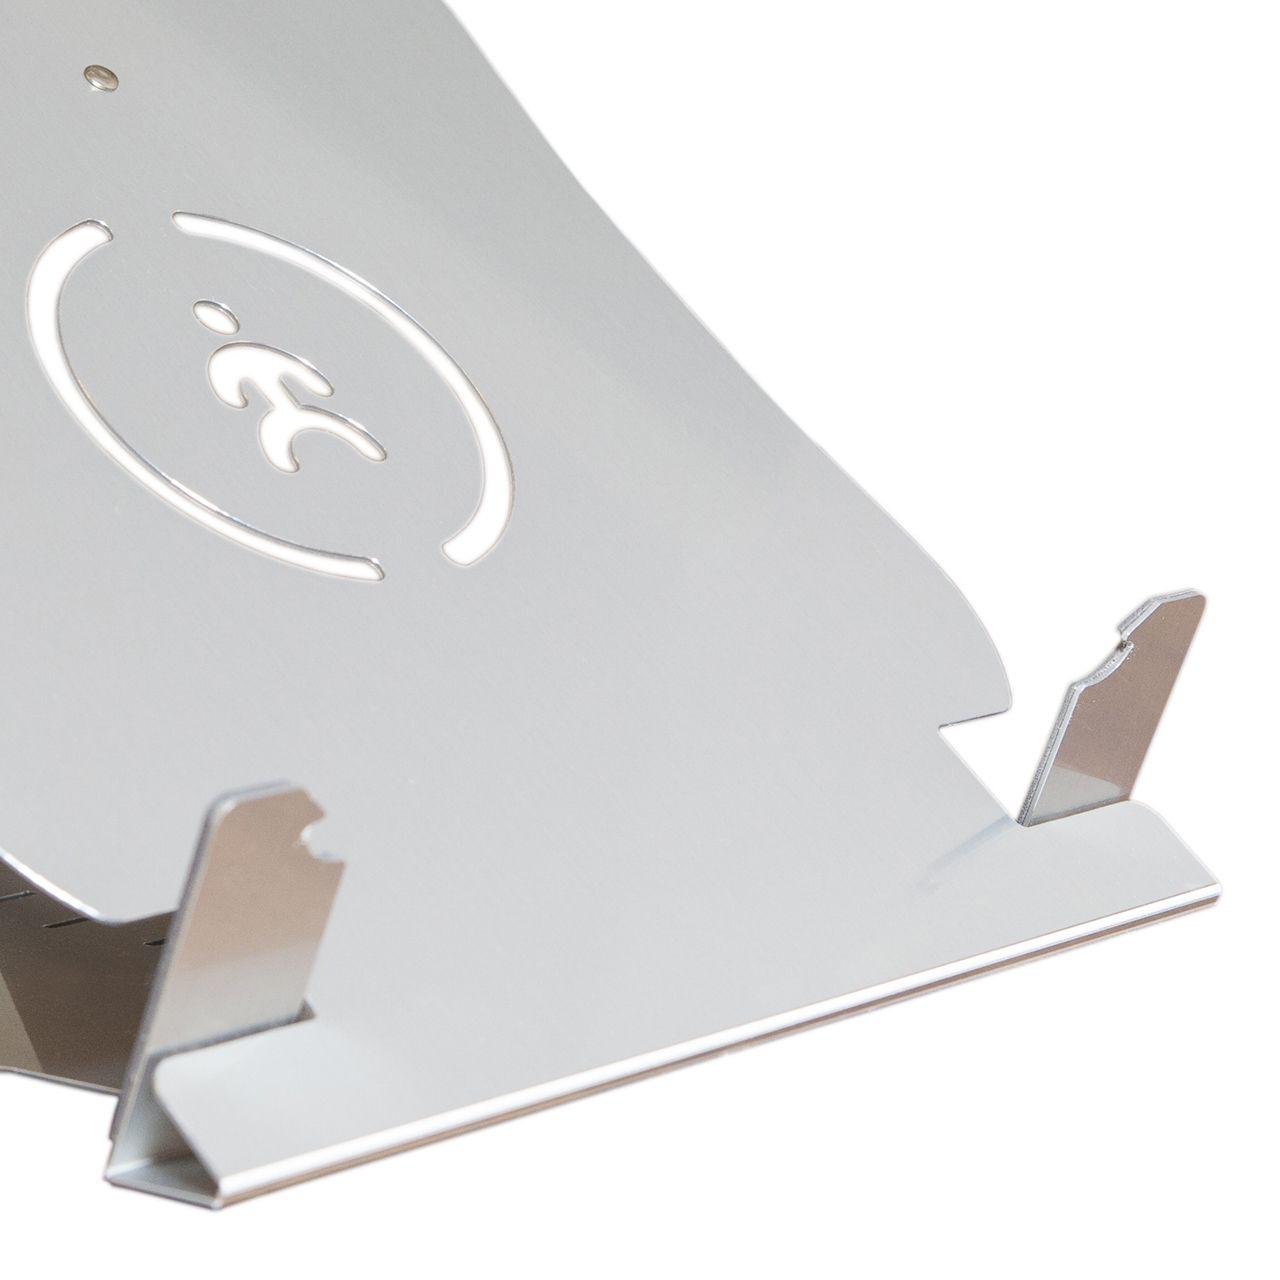 Topmate II laptopstandaard Detail